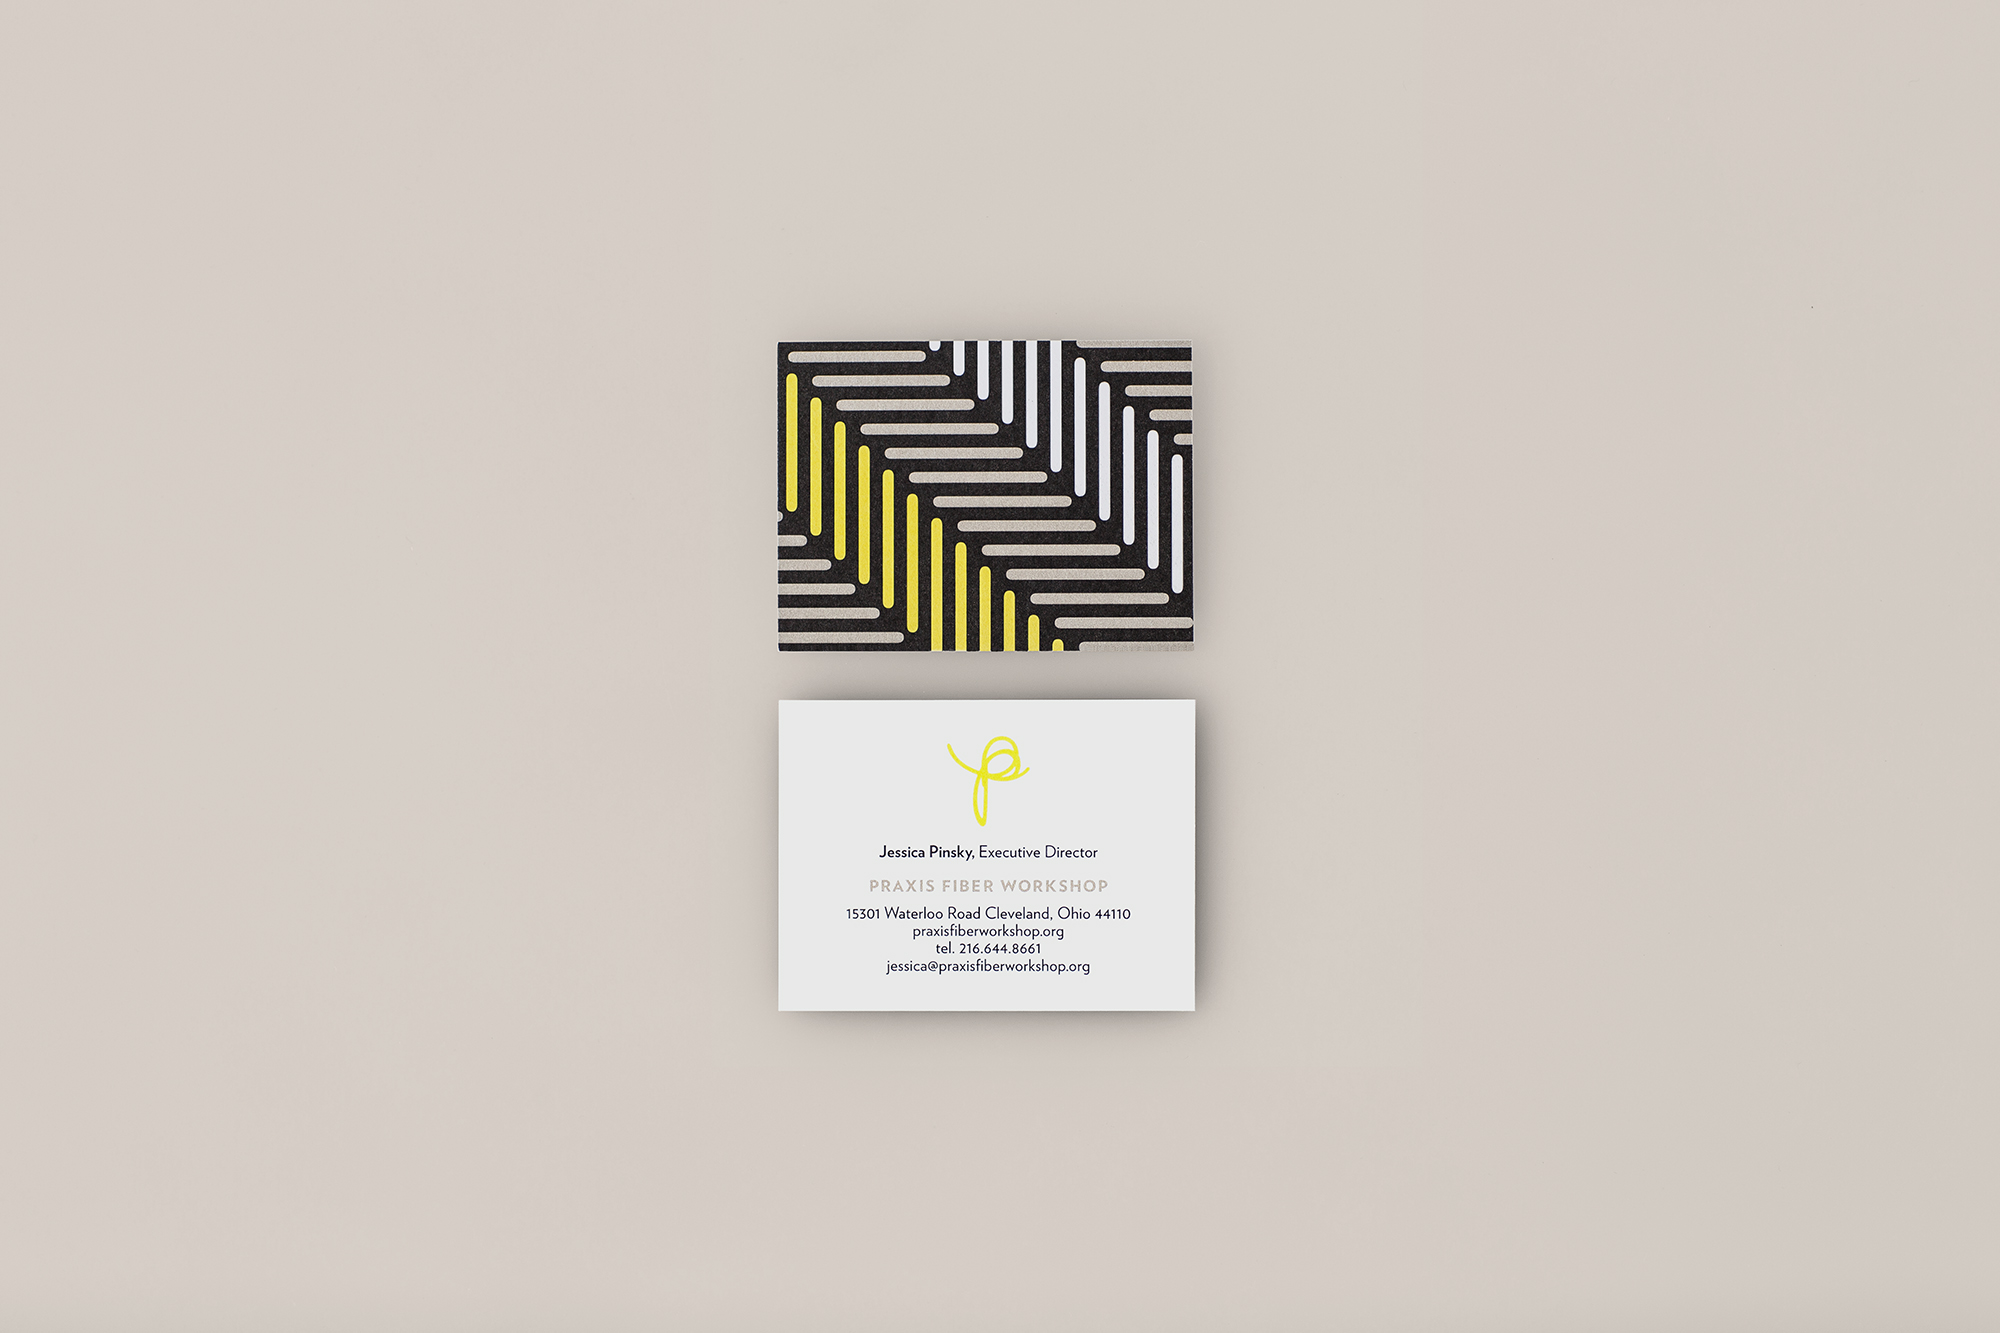 Agnes Studio Praxis Fiber Workshop business card